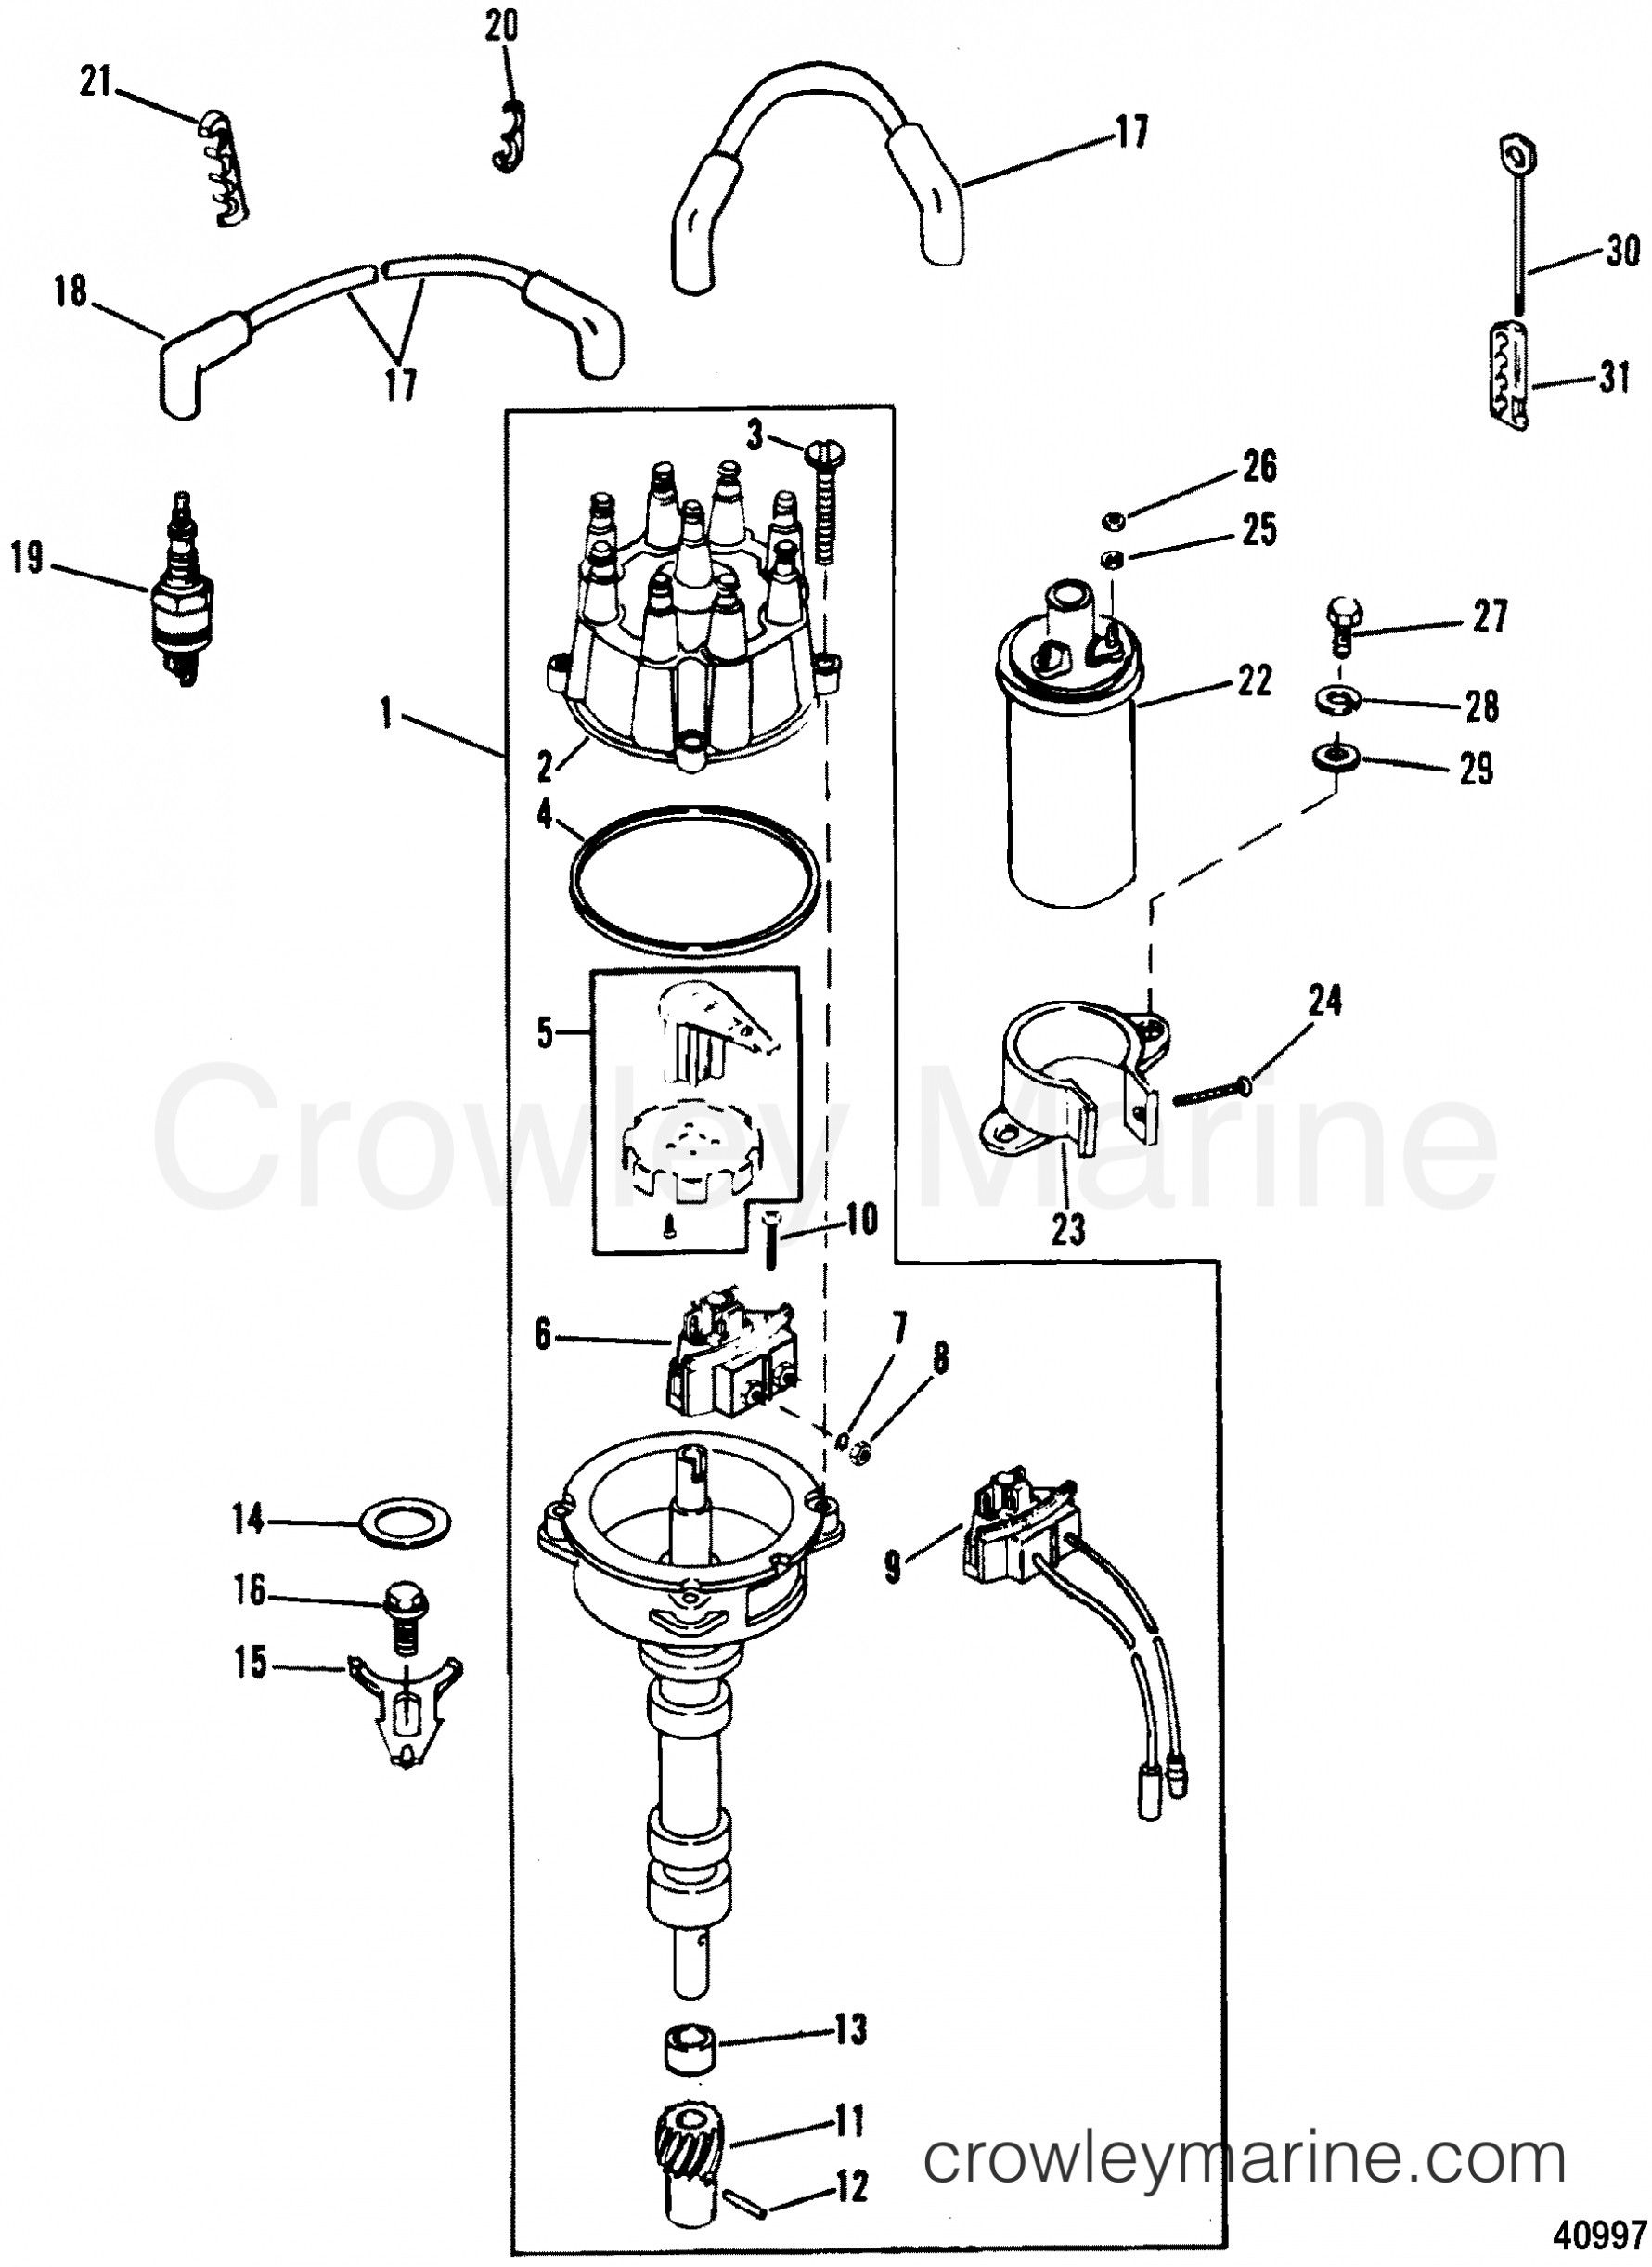 medium resolution of hiniker plow light diagrams service manual library in hiniker plow wiring diagram